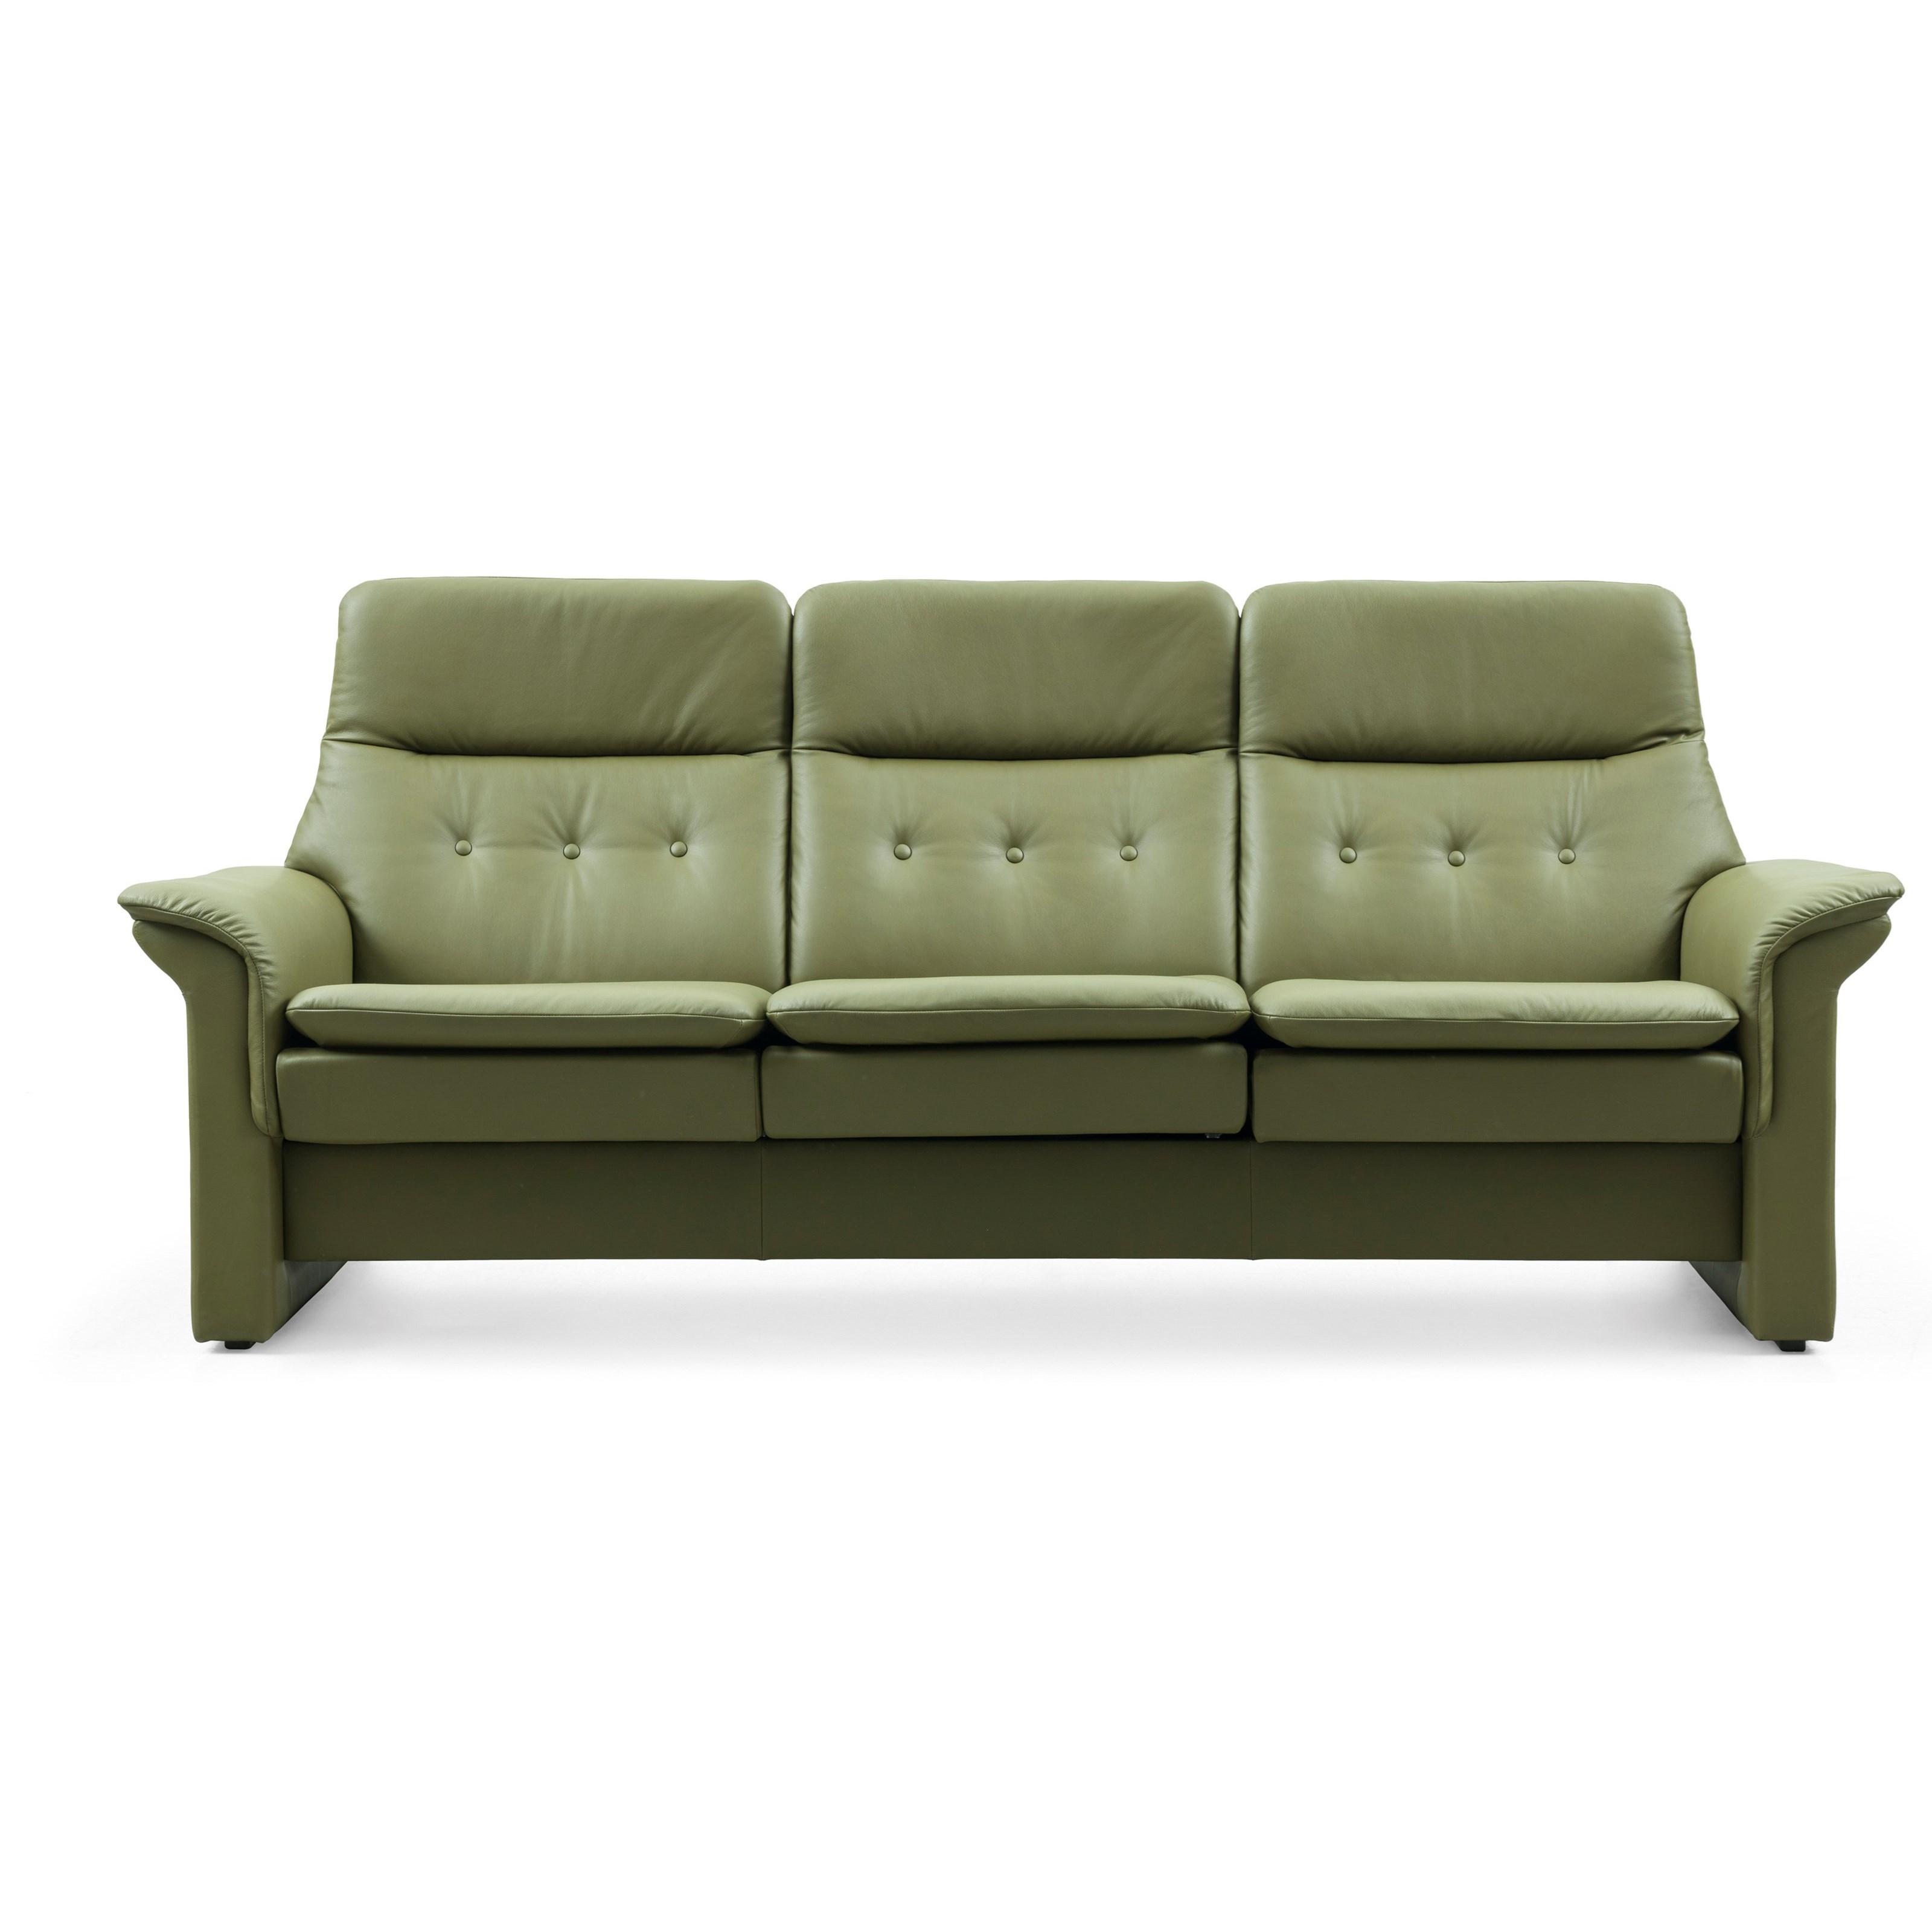 Saga High Back Reclining Sofa By Stressless